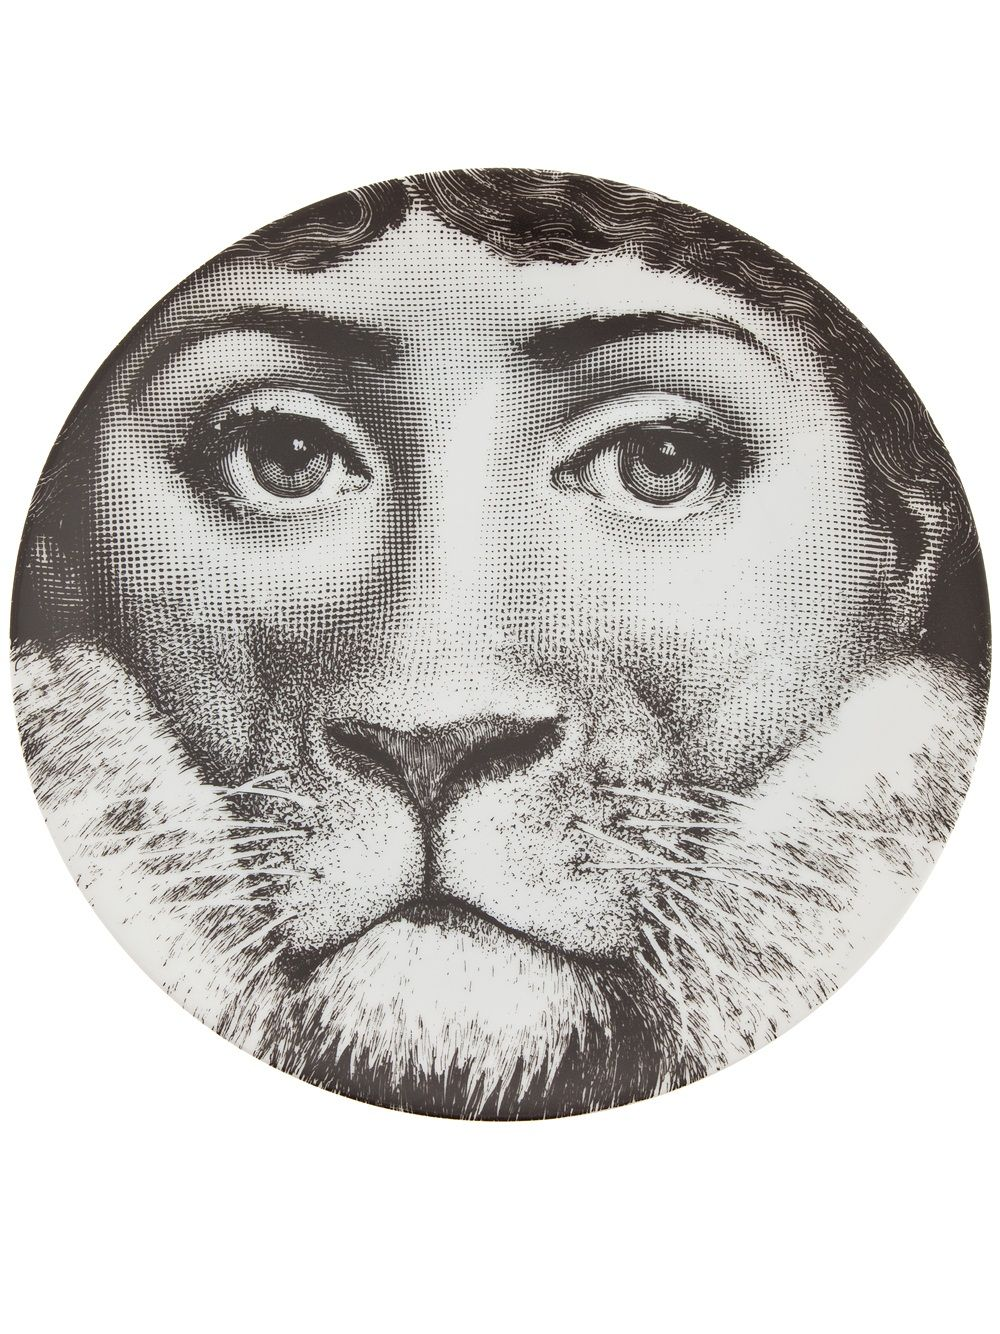 Fornasetti Art Prints Fornasetti Plate Shopping White Women And Black And White